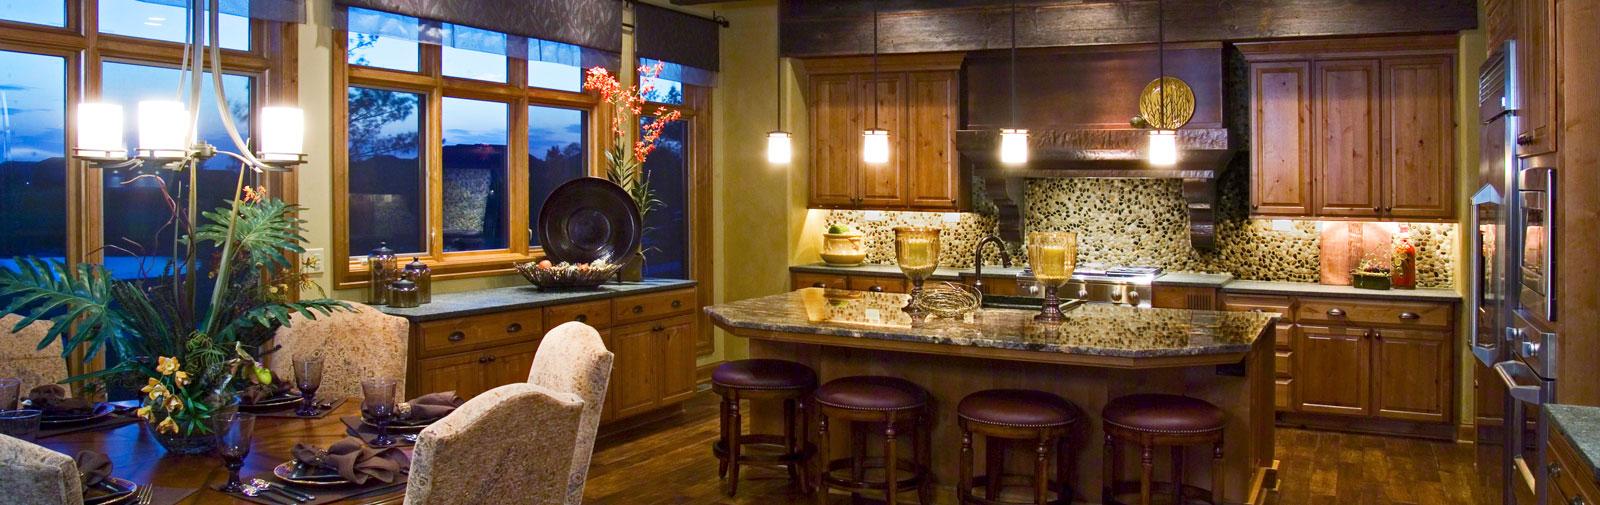 La home builders lincoln nebraska amazing kitchen design